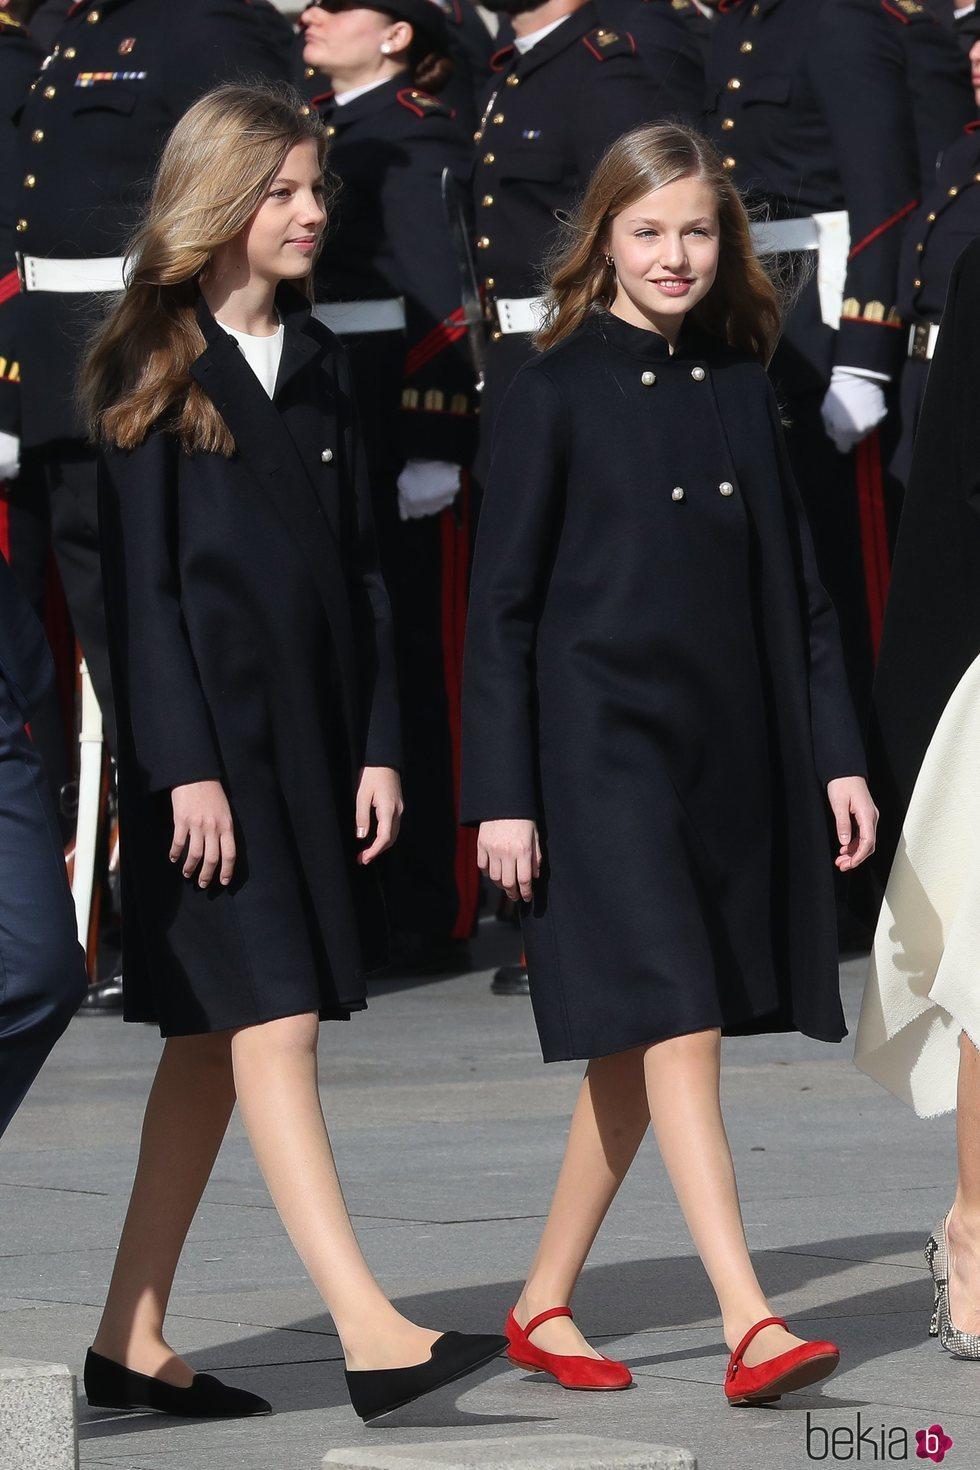 La Princesa Leonor y la Infanta Sofía en la Apertura de la XIV Legislatura